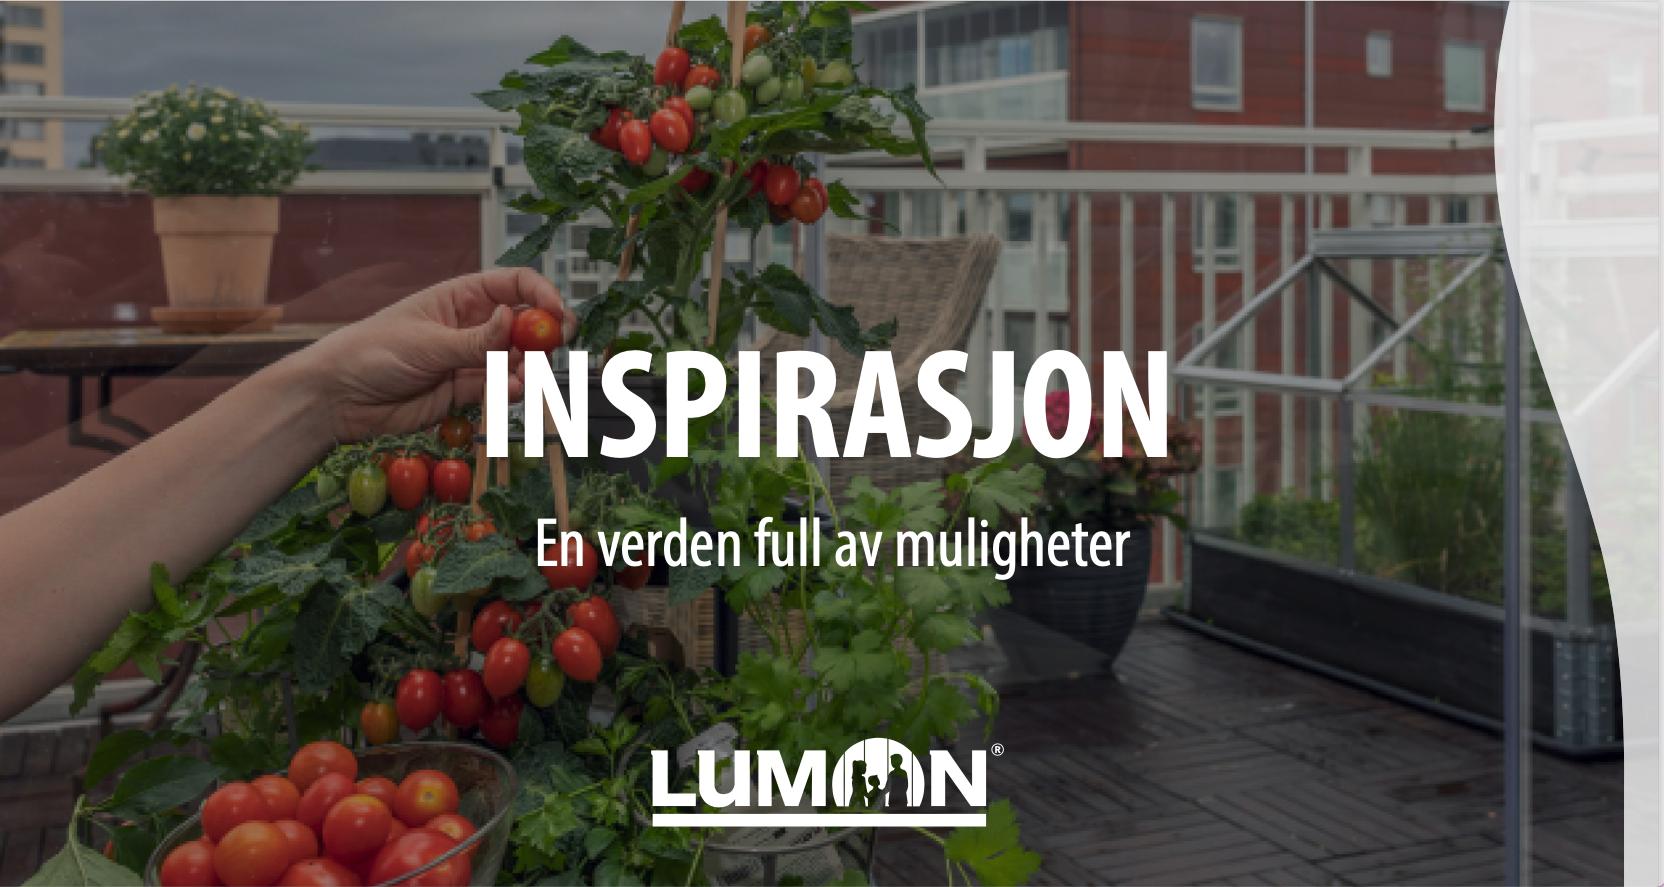 NO Inspirasjonsguide Lumon Norge